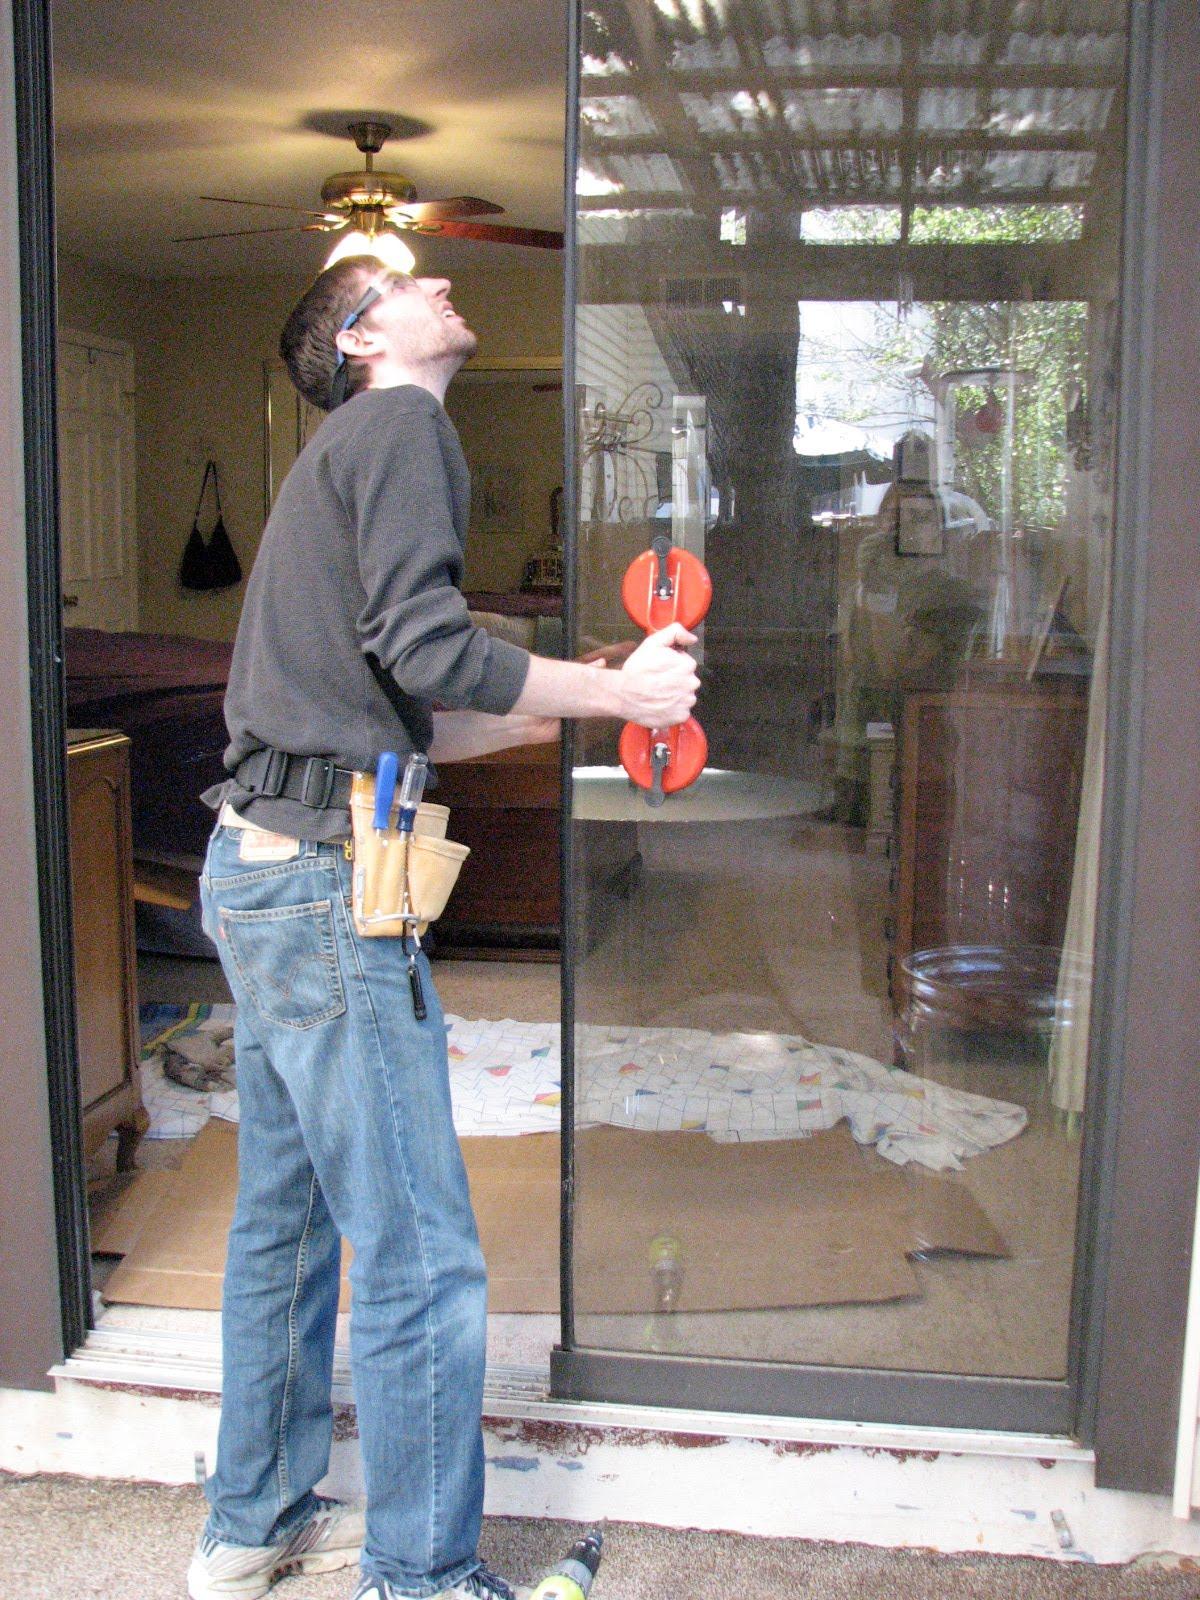 Handy Work Made Easy Replacing Rollers On Sliding Glass Door